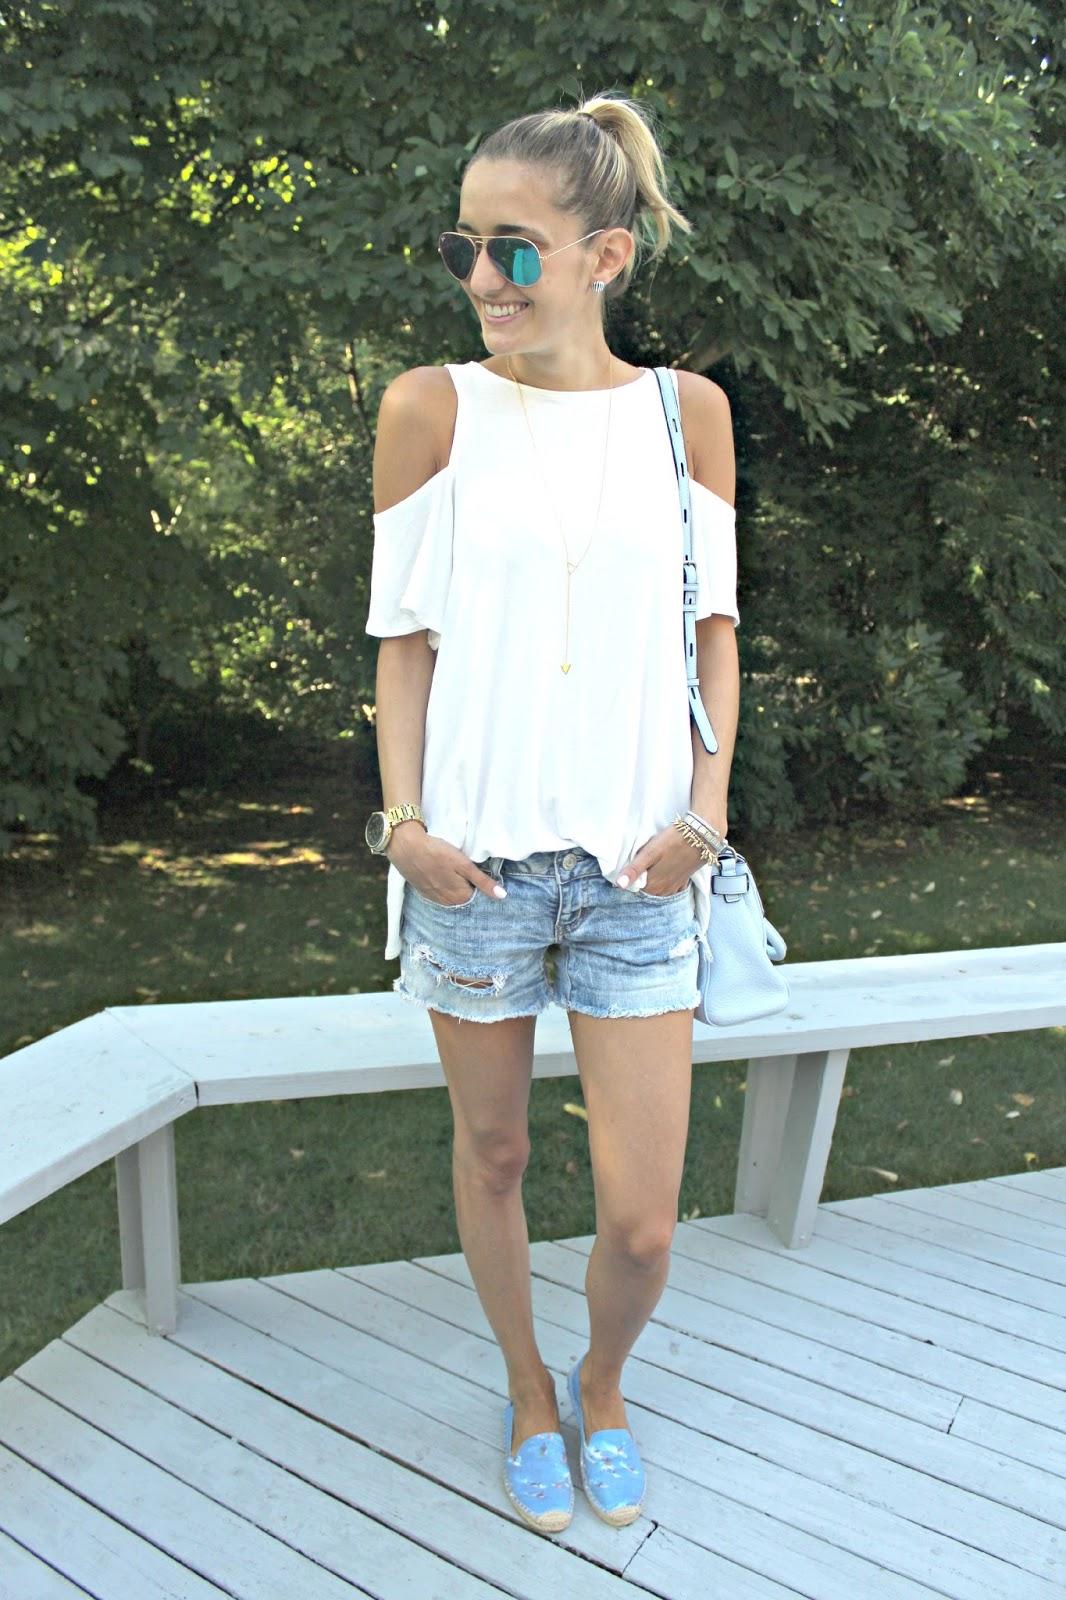 must have denim shorts for summer